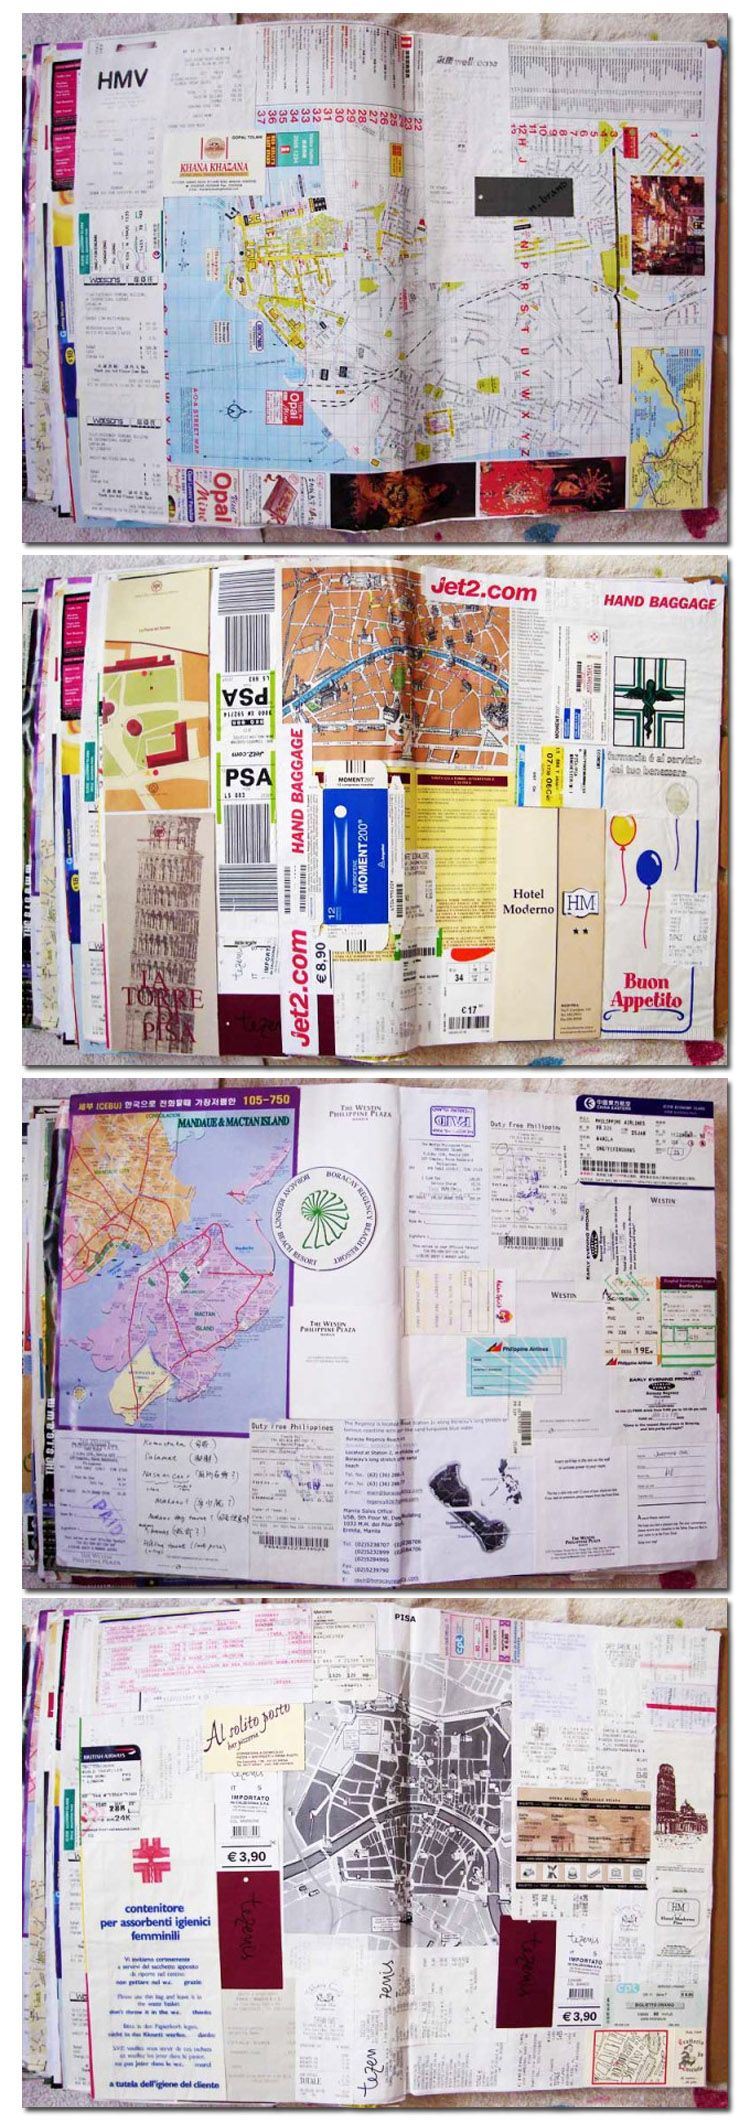 Scrapbook ideas for your boyfriend - Travel Scrapbook Idea Http Shantihshalaholisticarts Com Global Travel Scrapbook